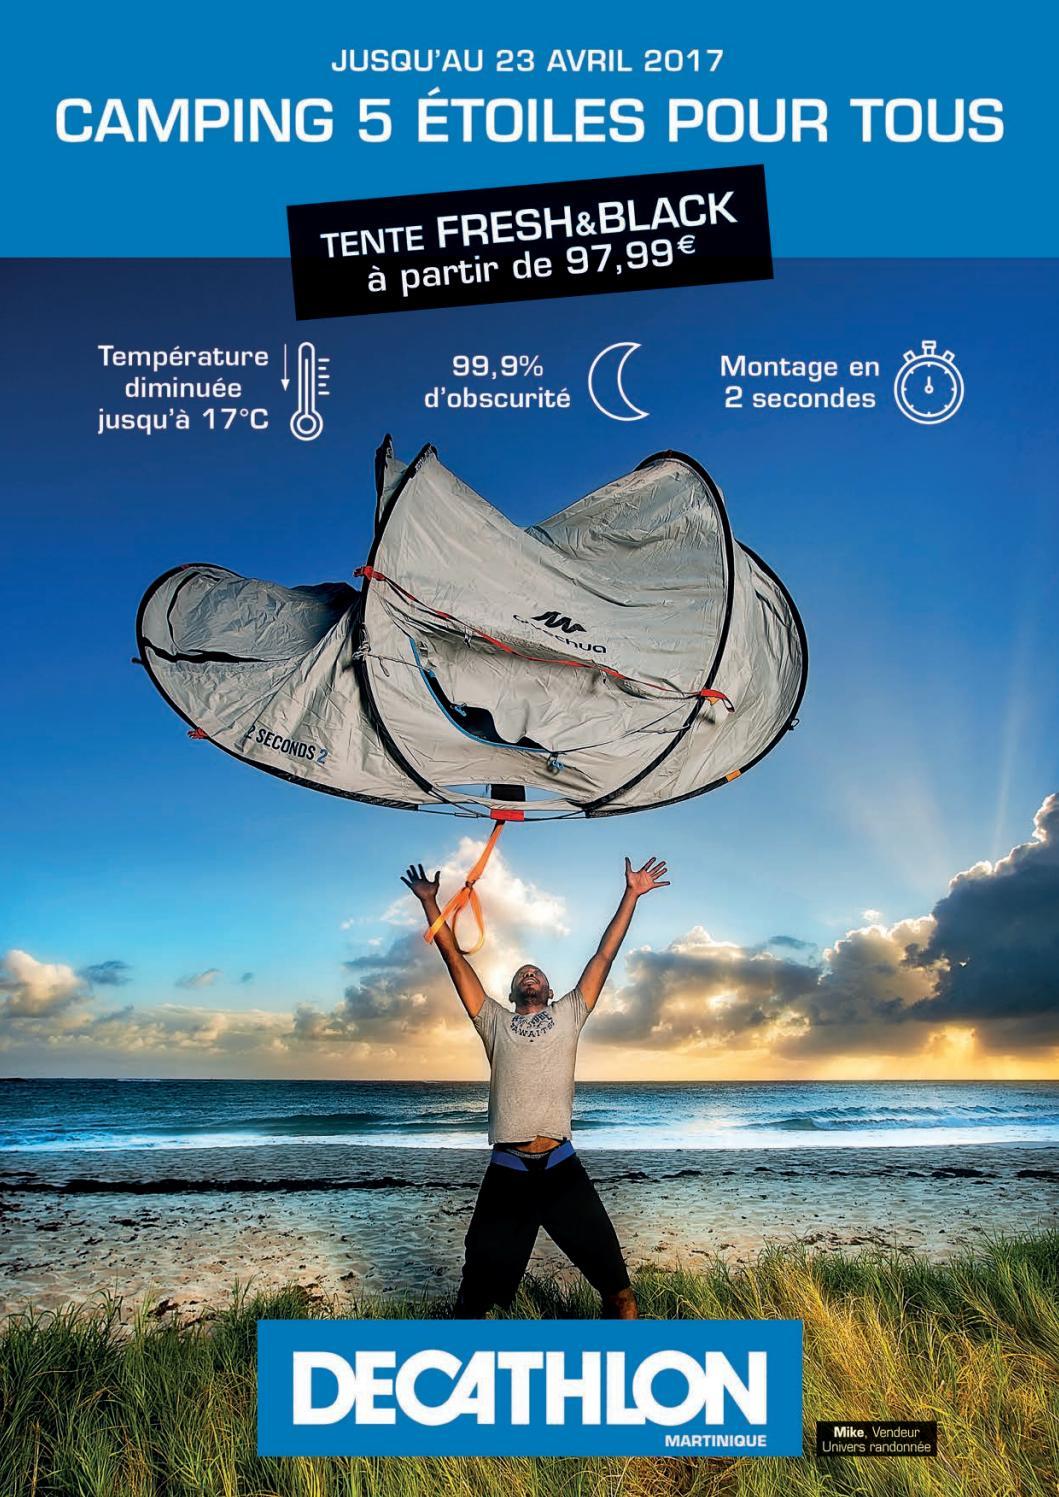 Decathlon Martinique : Camping 5 Etoiles ! (Jusqu'au 23 ... dedans Matelas Gonflable Piscine Decathlon